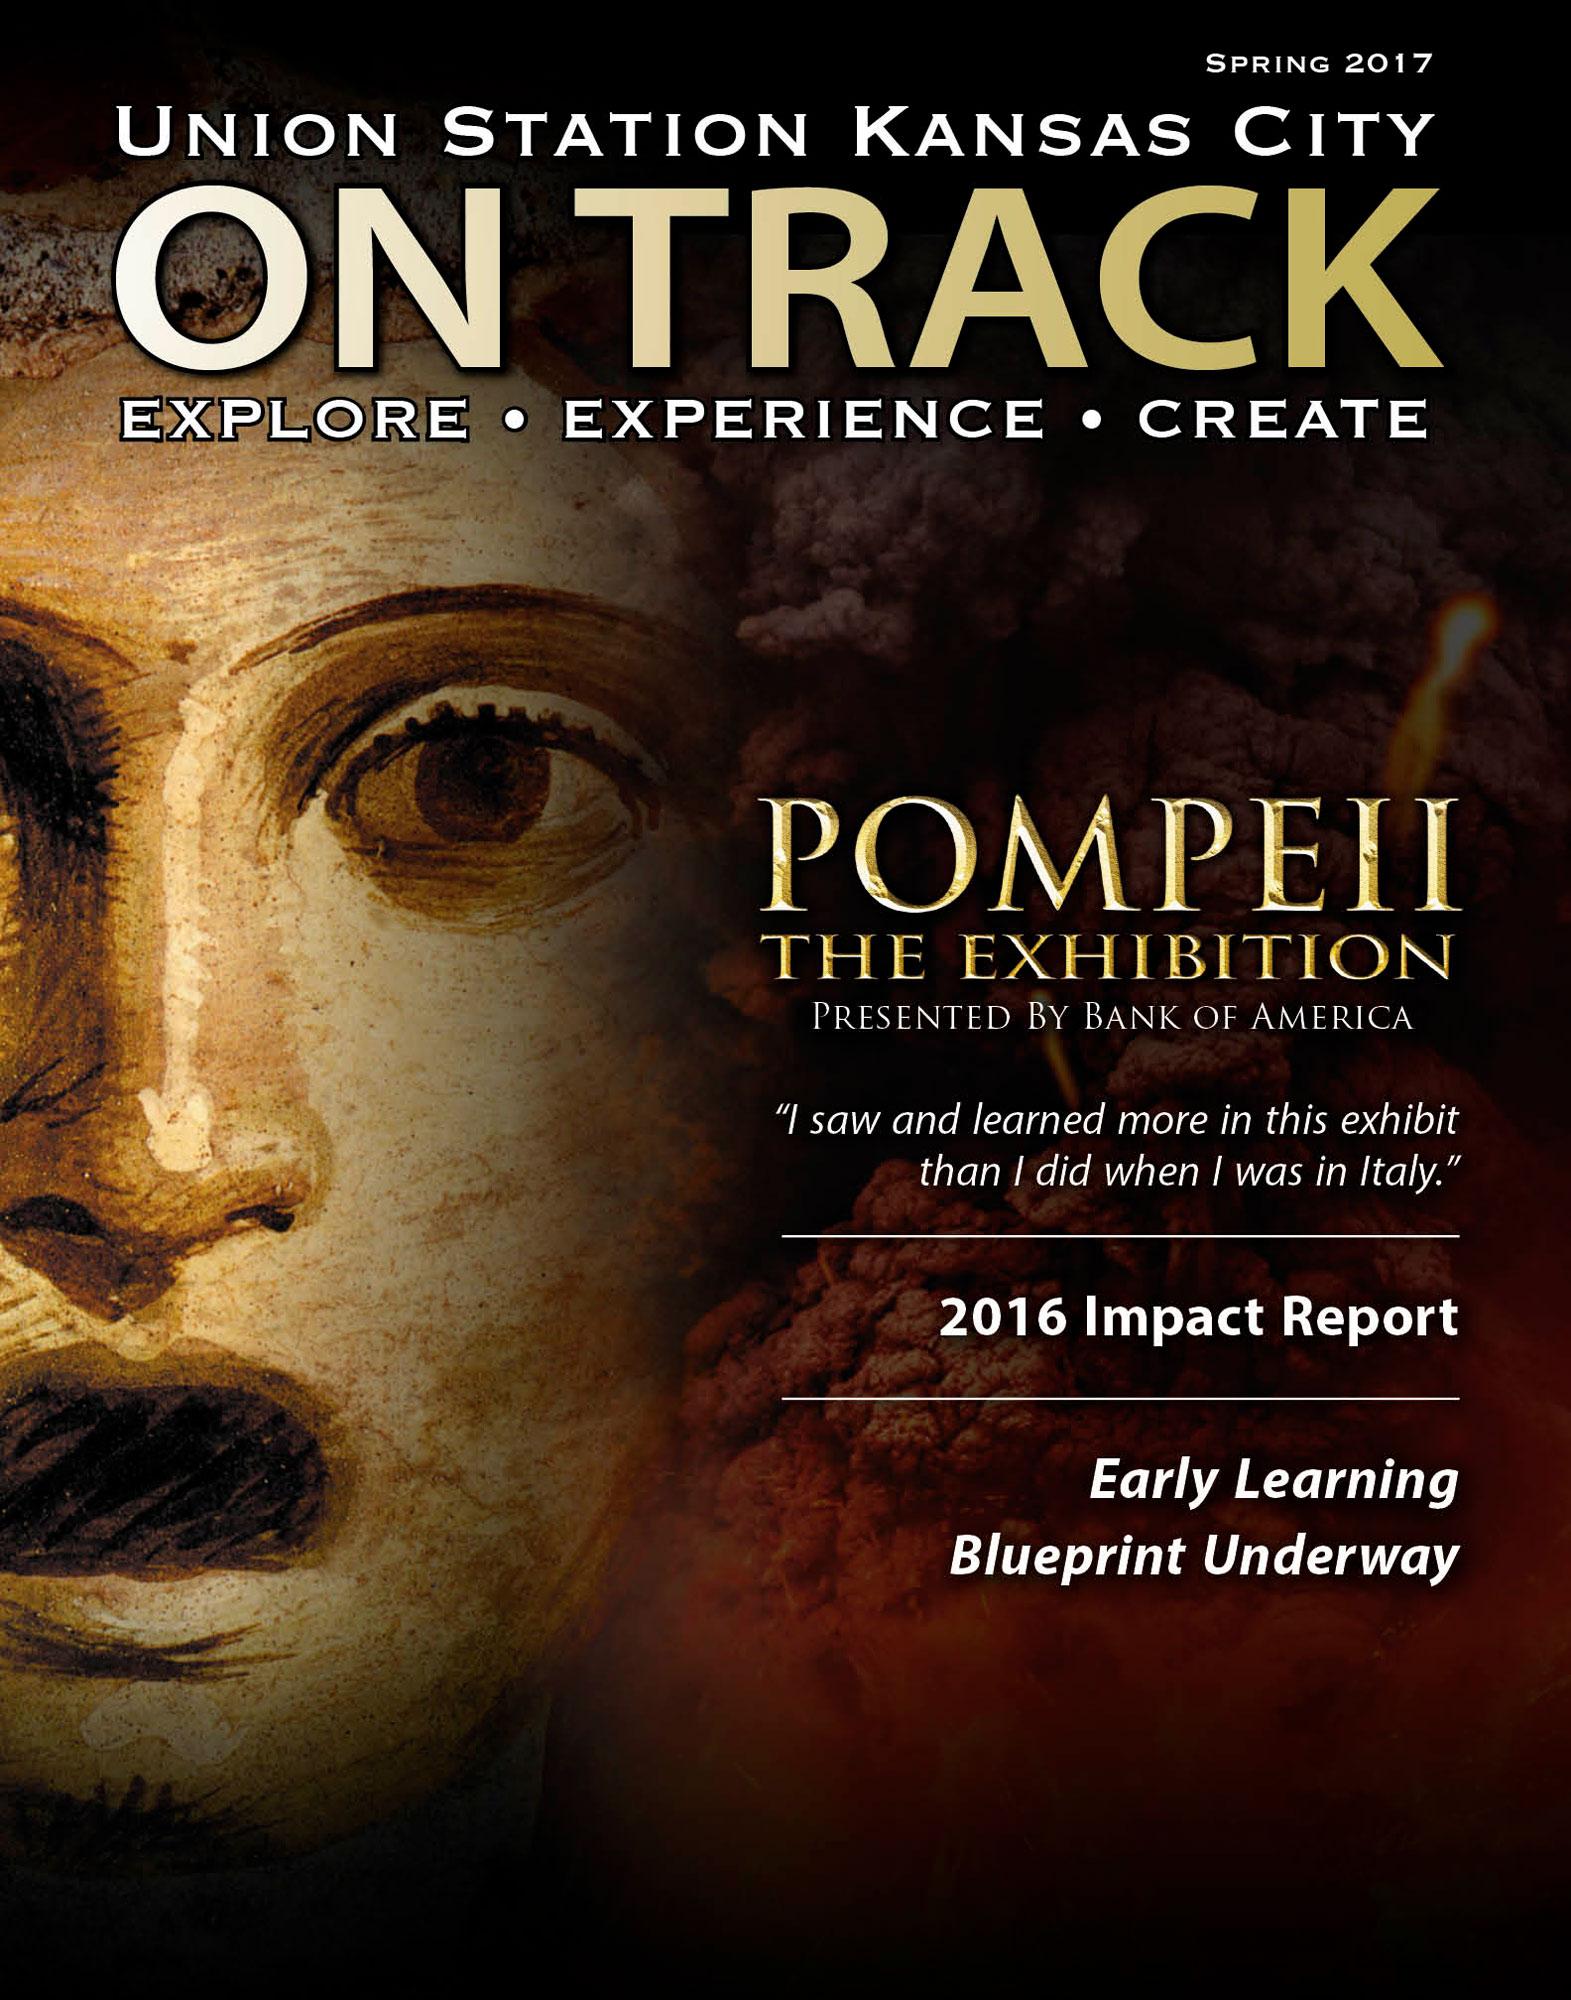 On Track Magazine - Pompeii